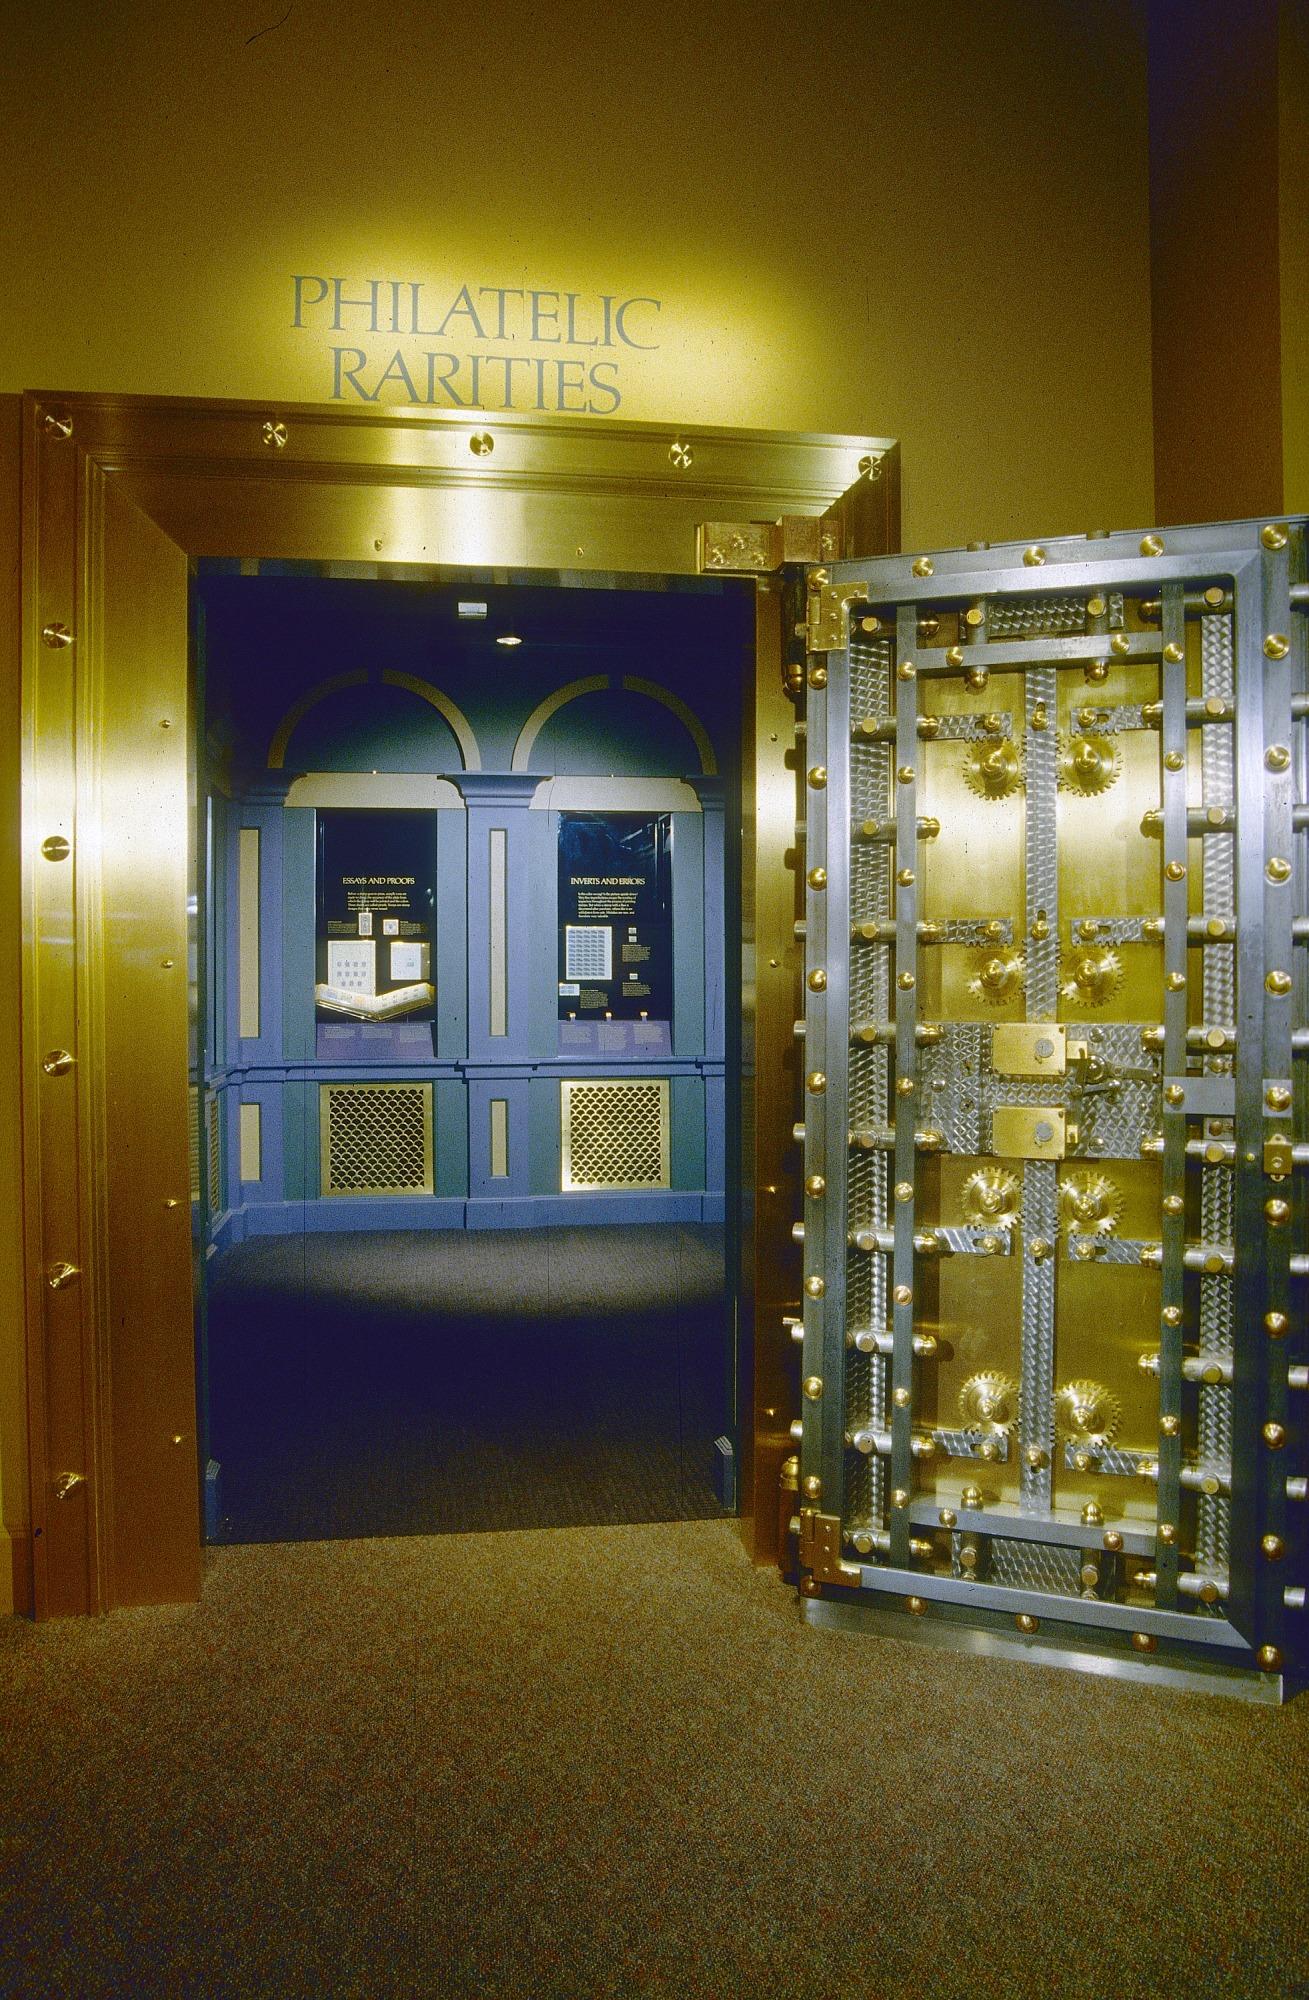 Entrance to Philatelic Rarities Vault at National Postal Museum